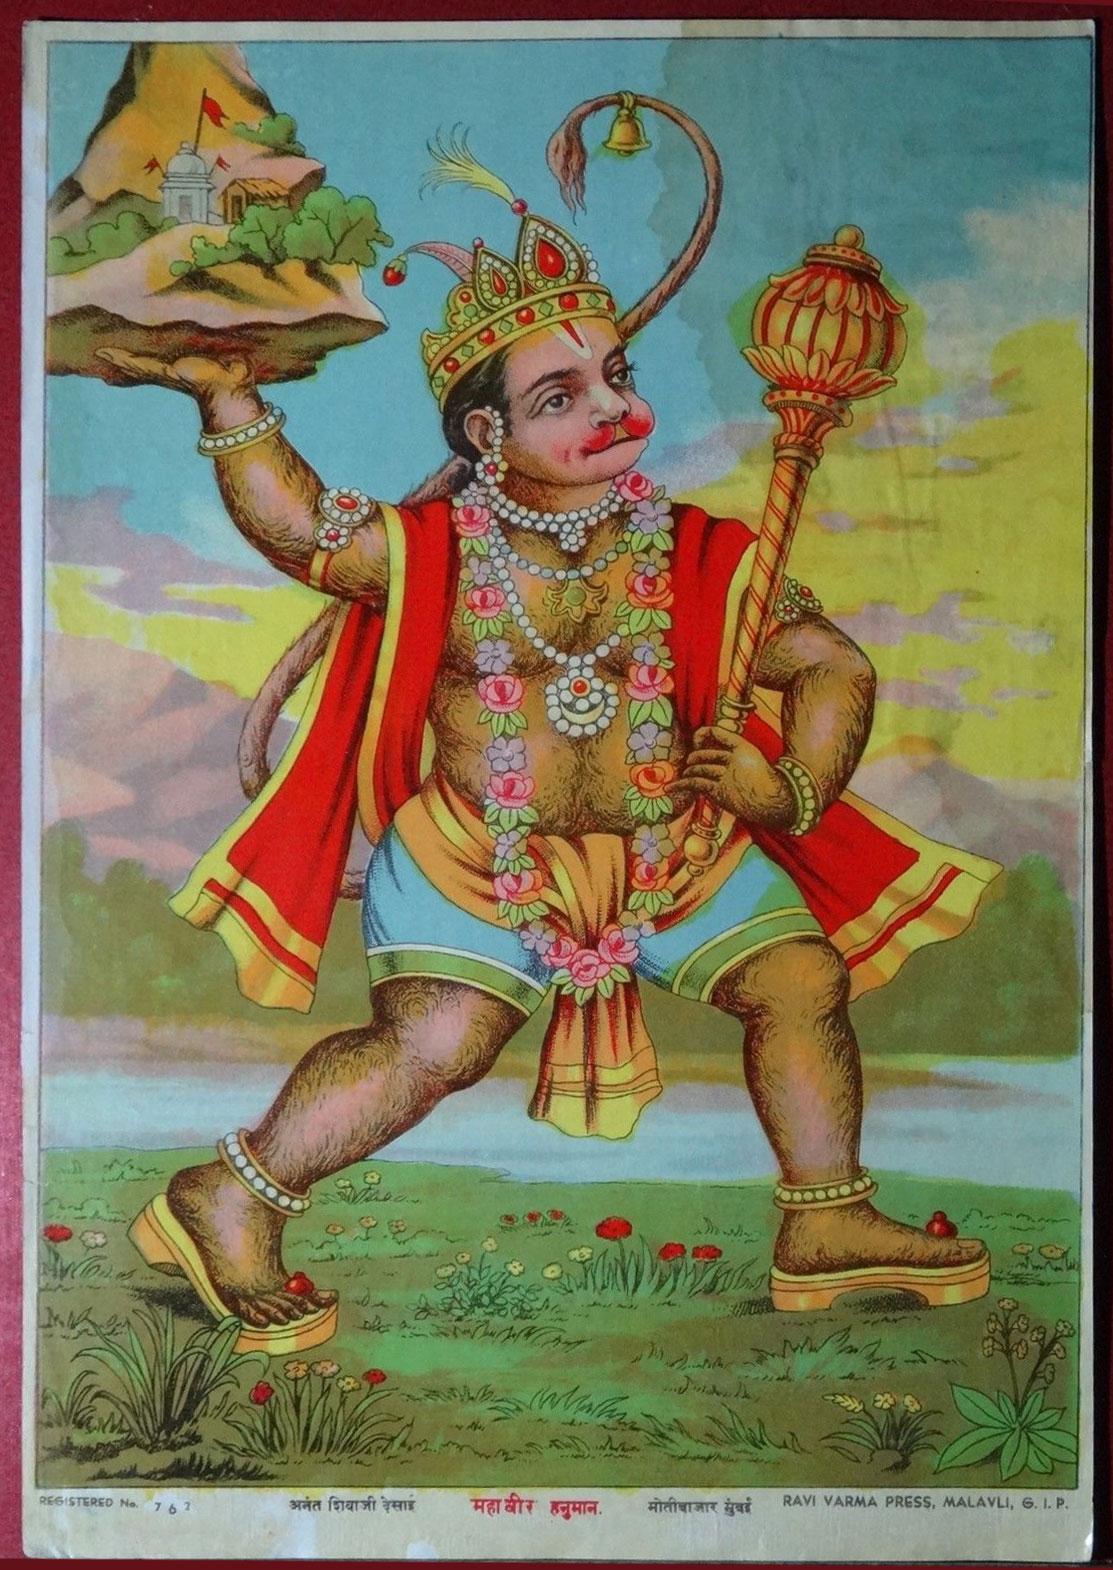 Hanuman - Vintage Olegraph/Lithograph Print, Ravi Varma Press c1910-20